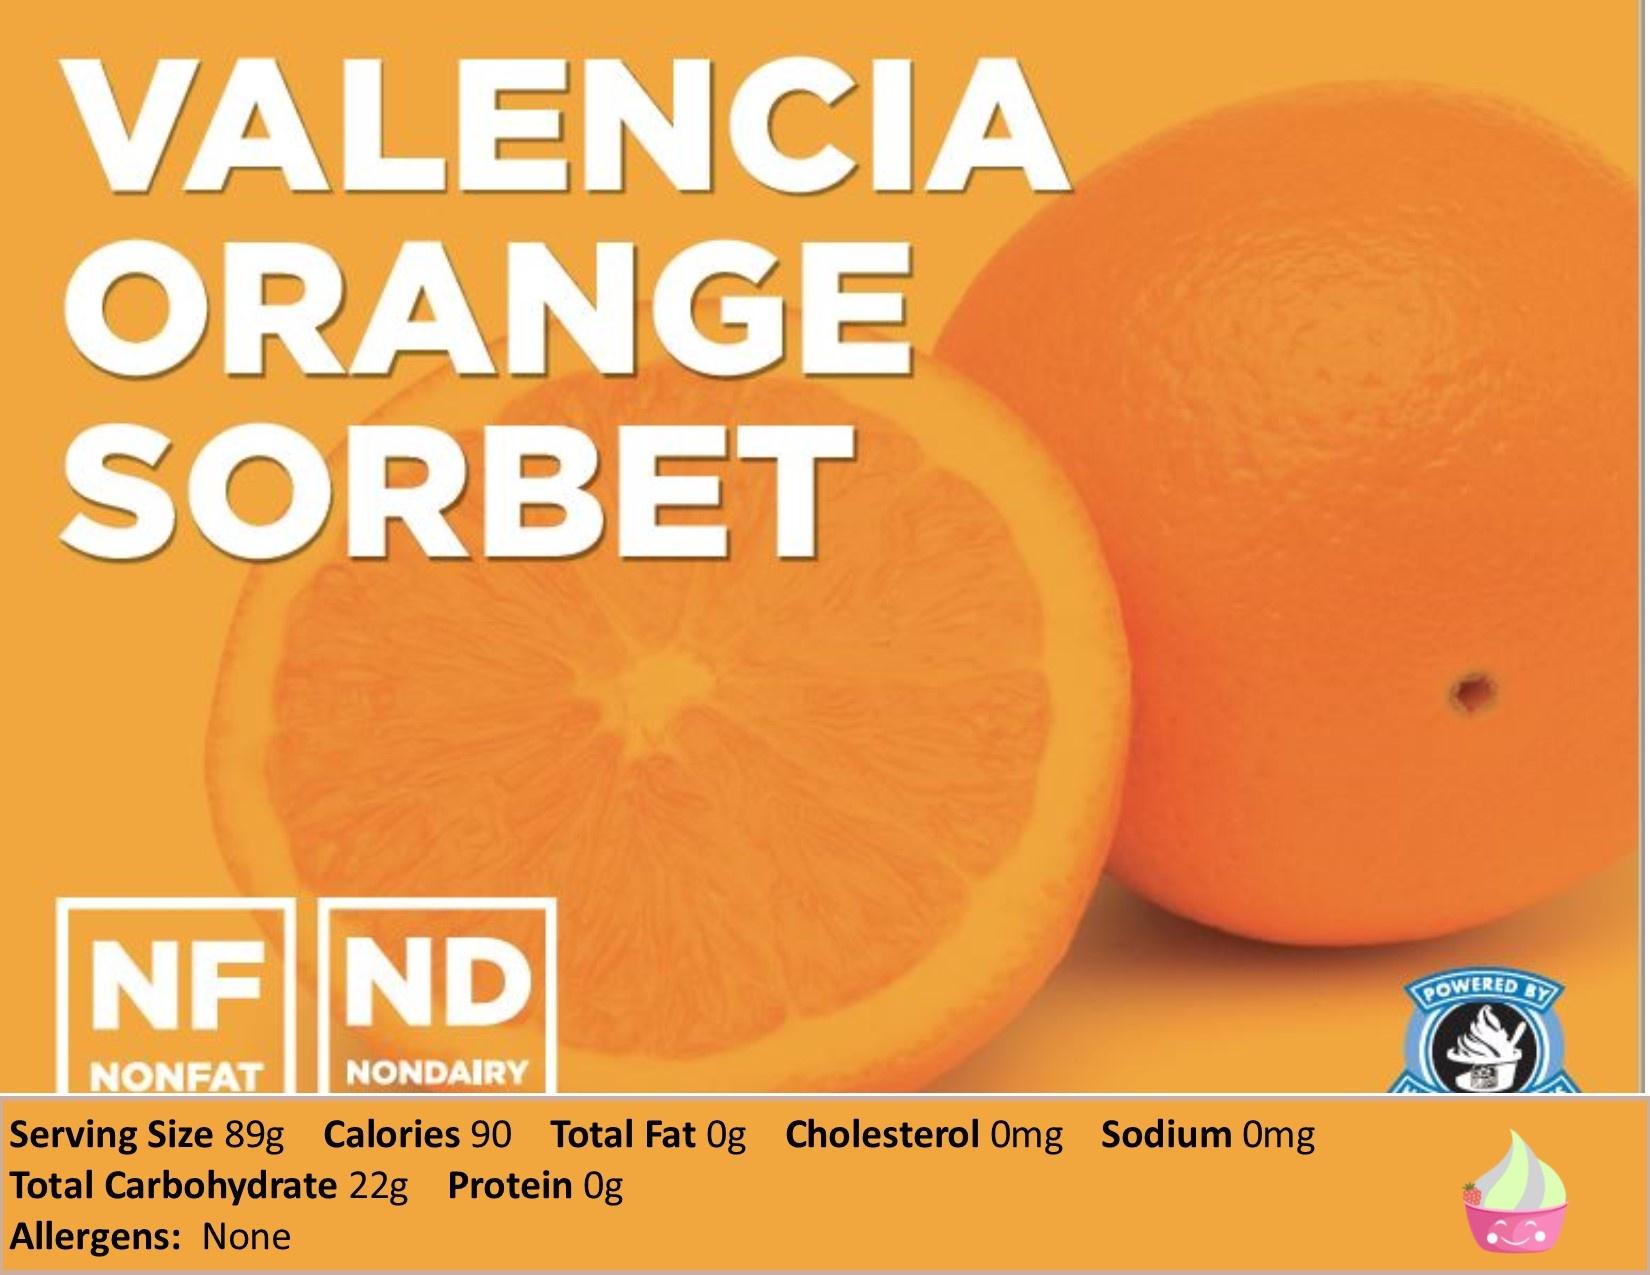 https://0201.nccdn.net/1_2/000/000/12d/884/Valencia-Orange-Sorbet-1650x1275.jpg